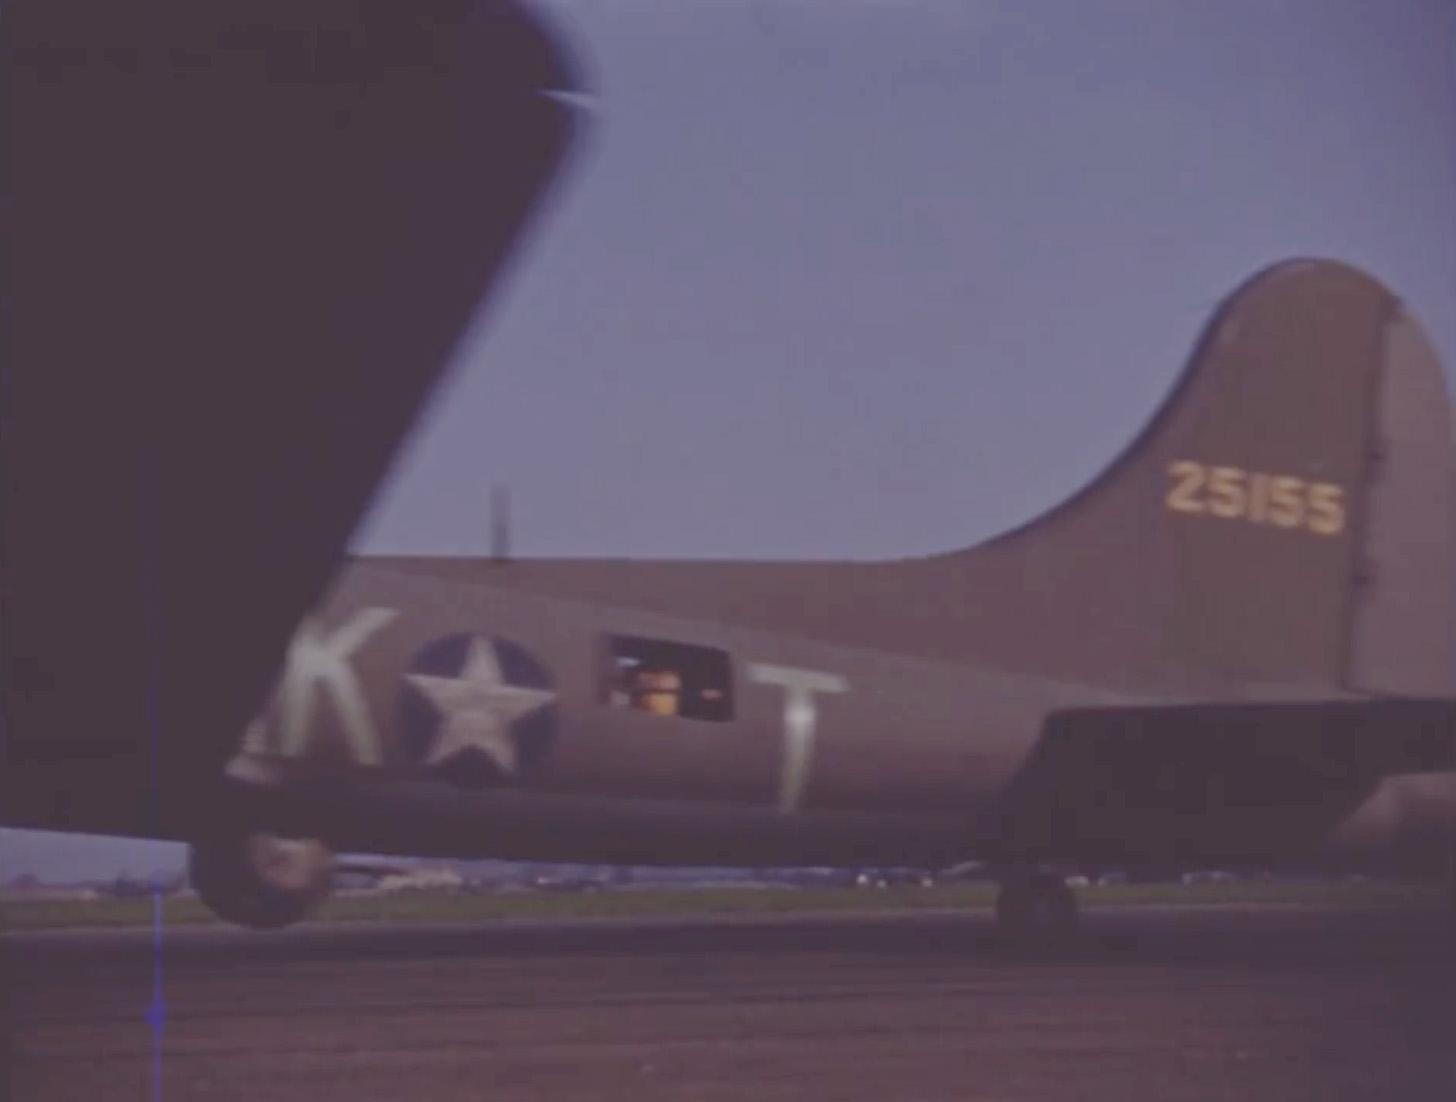 B-17 #42-5155